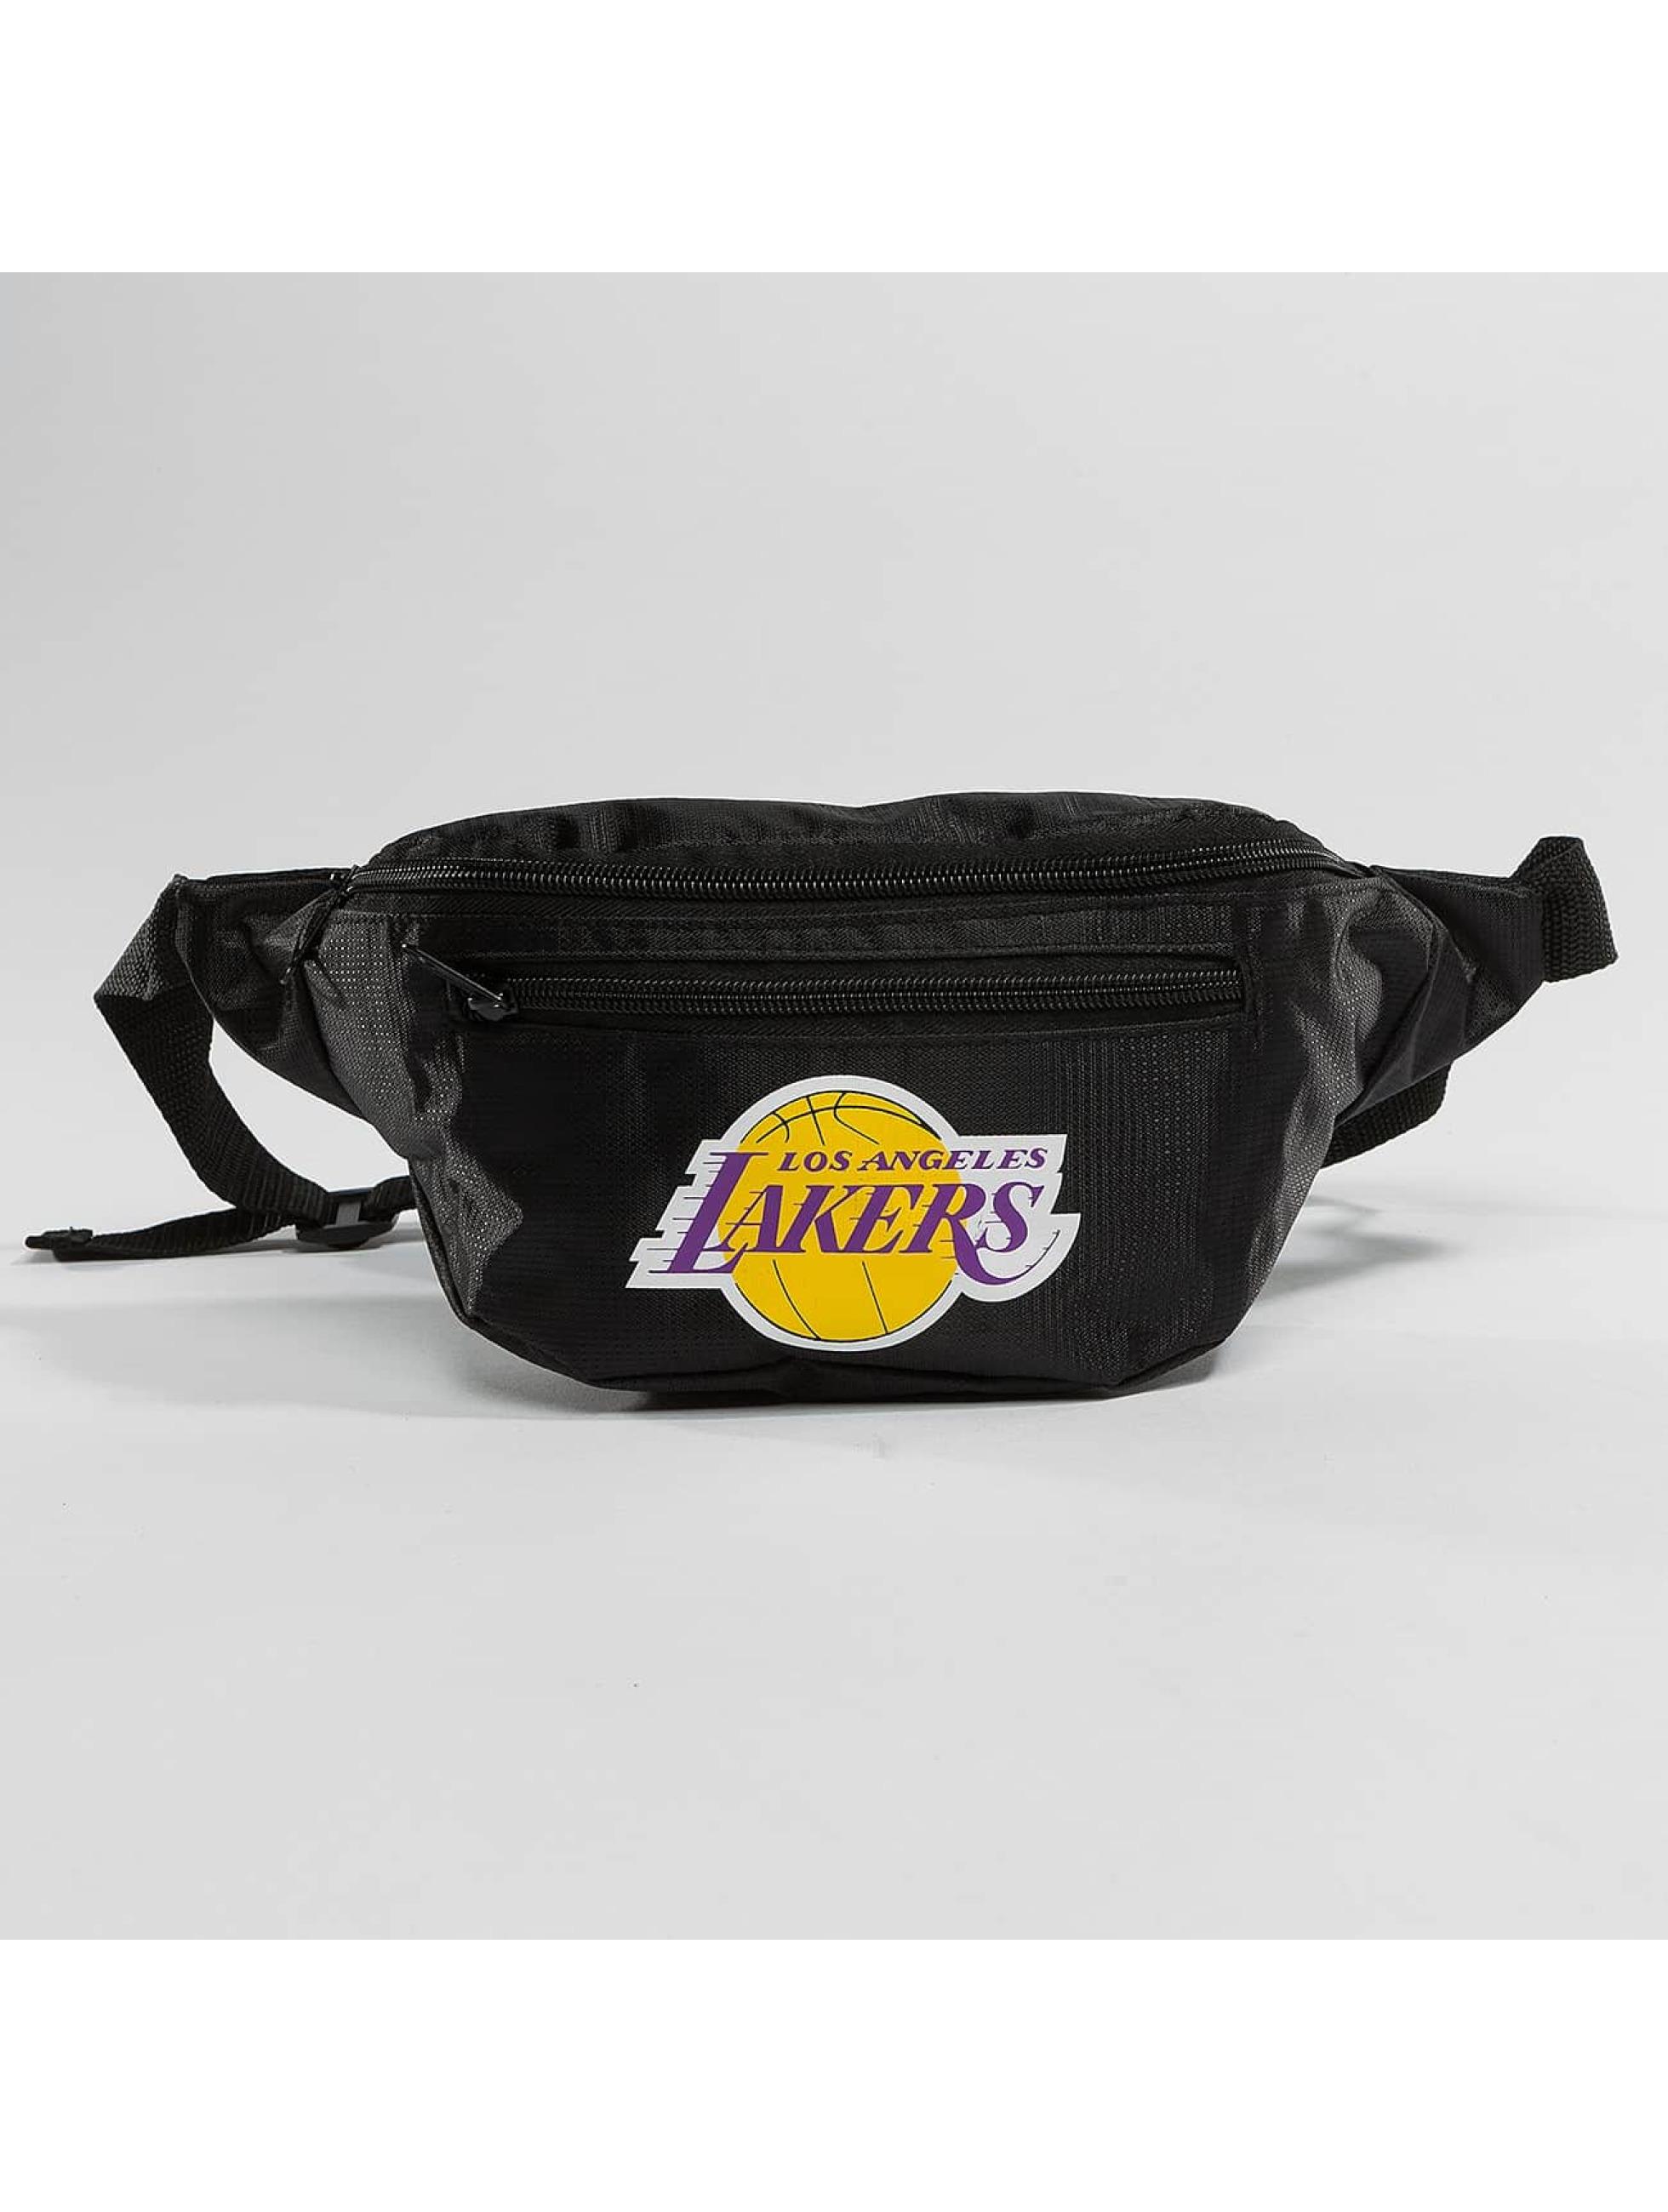 Forever Collectibles Männer,Frauen Tasche NBA LA Lakers in schwarz